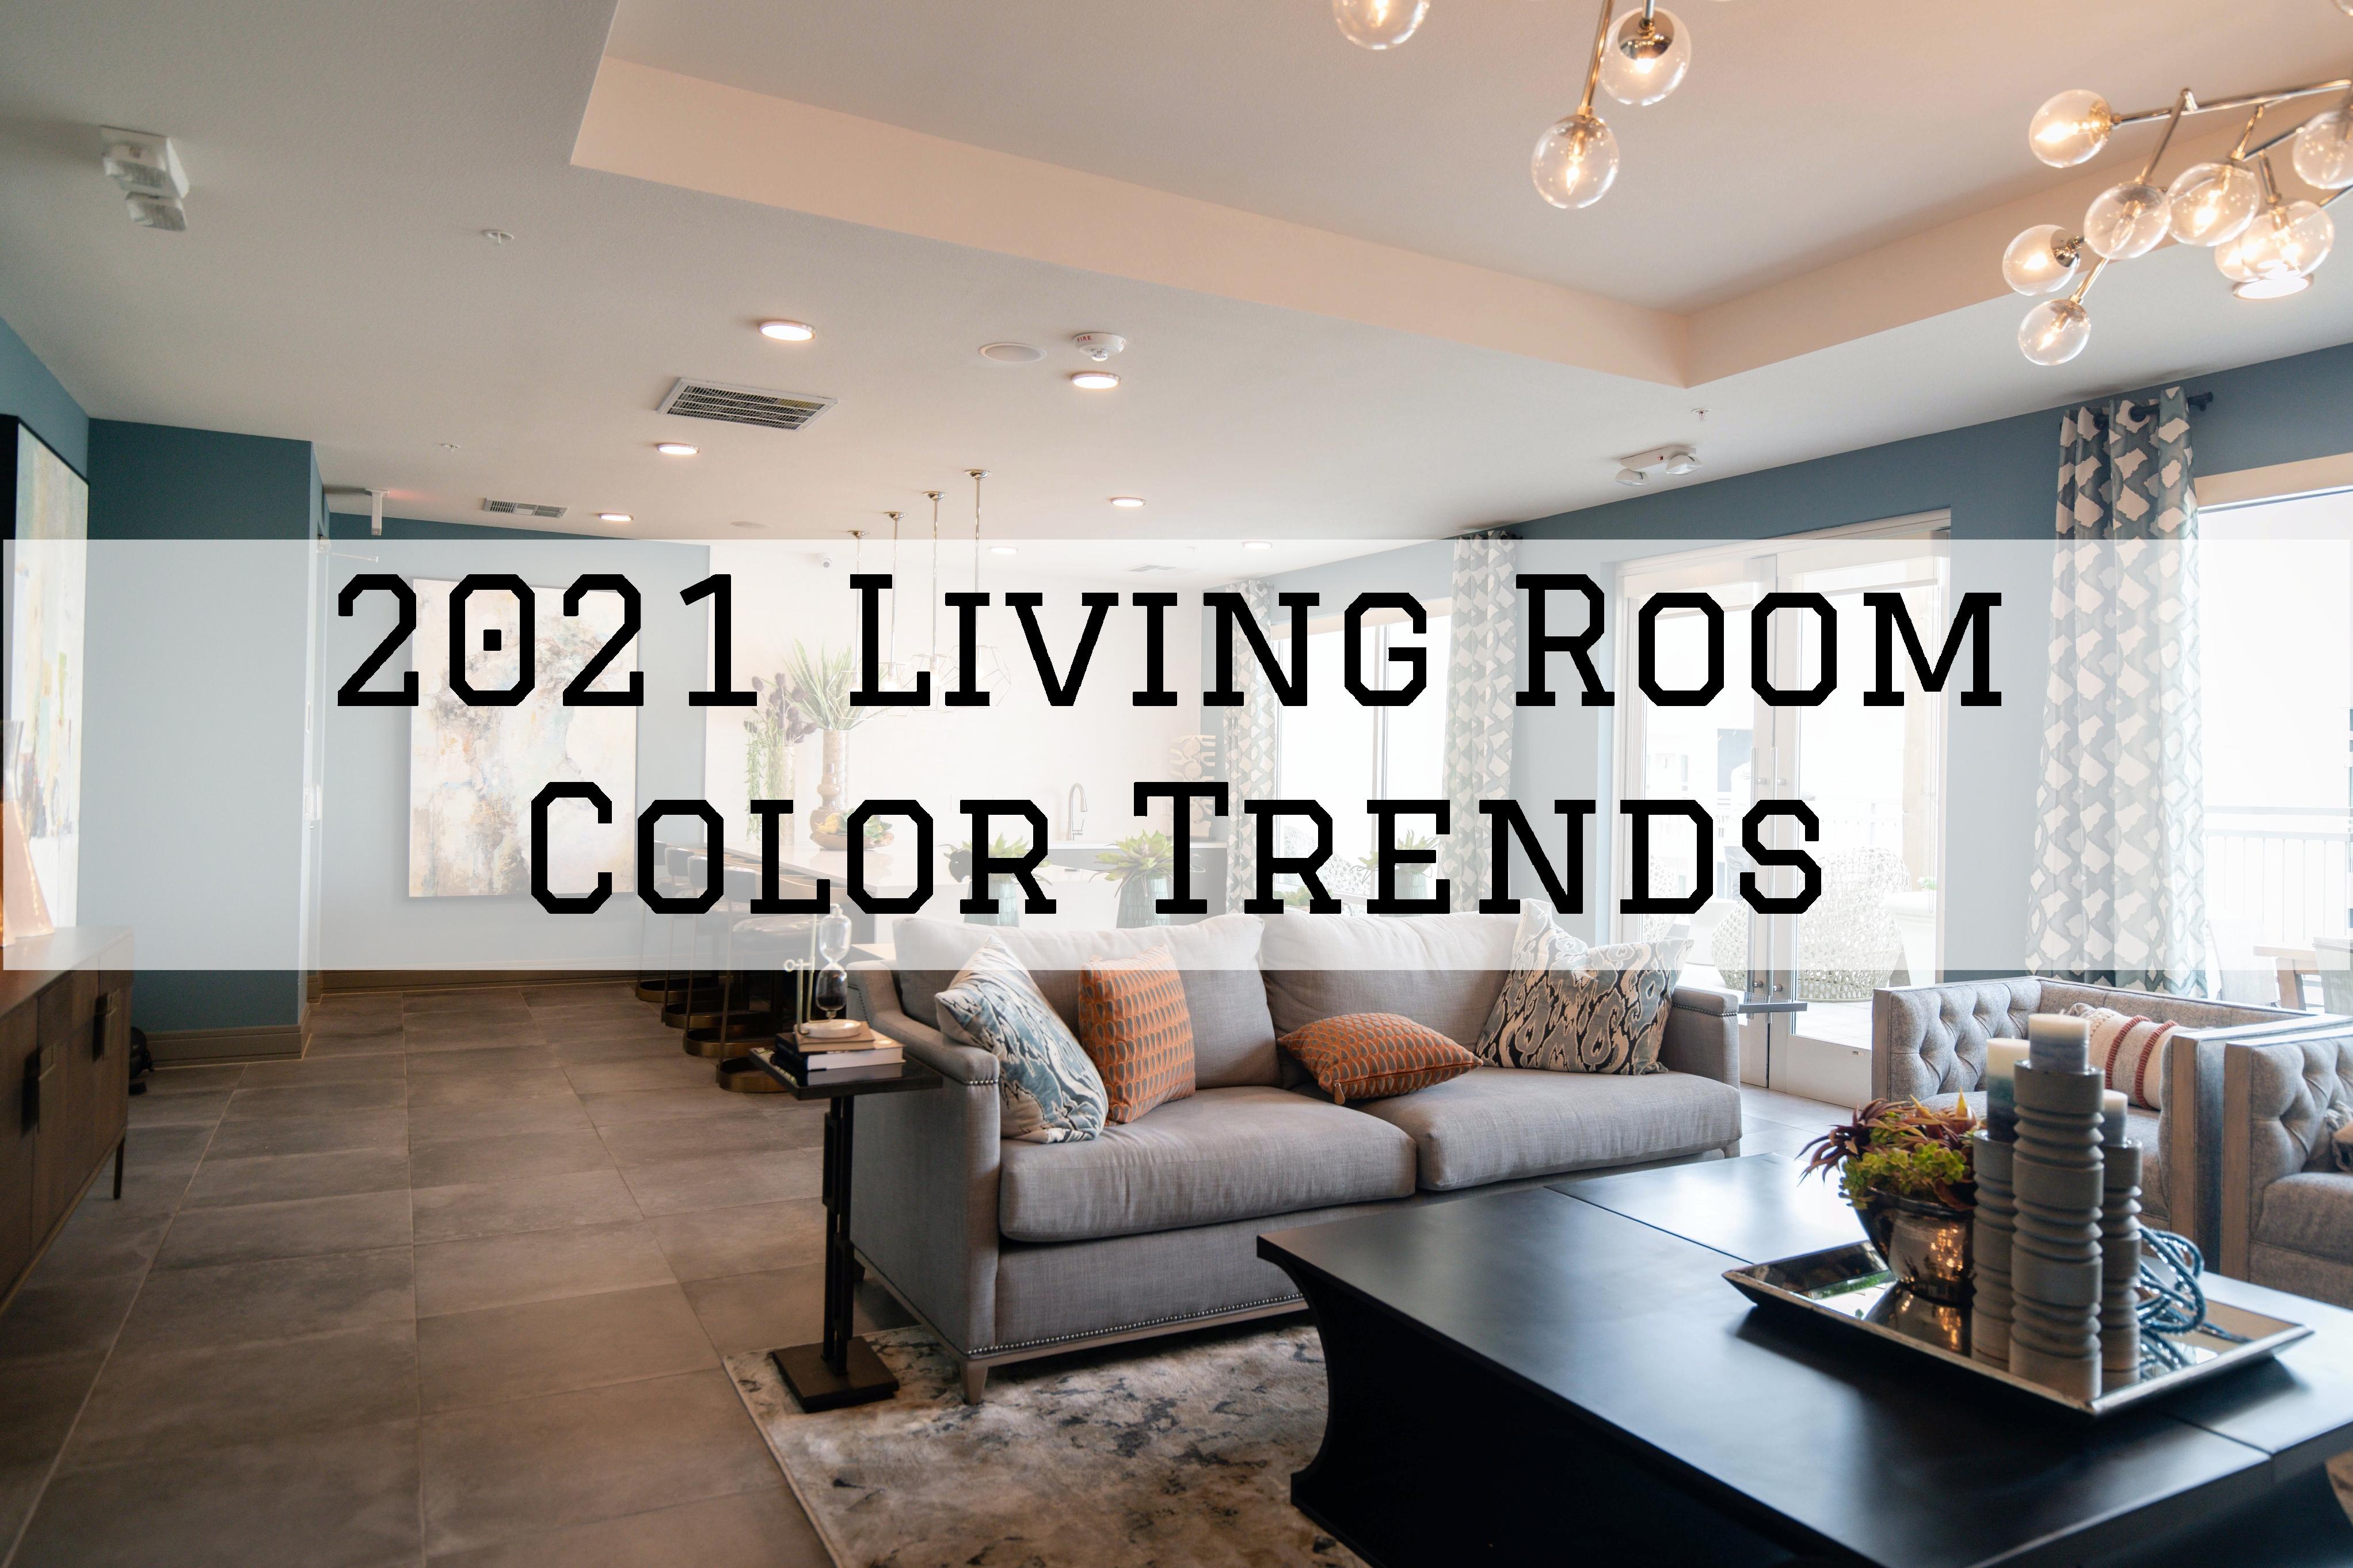 2021 Living Room Color Trends in Omaha, NE